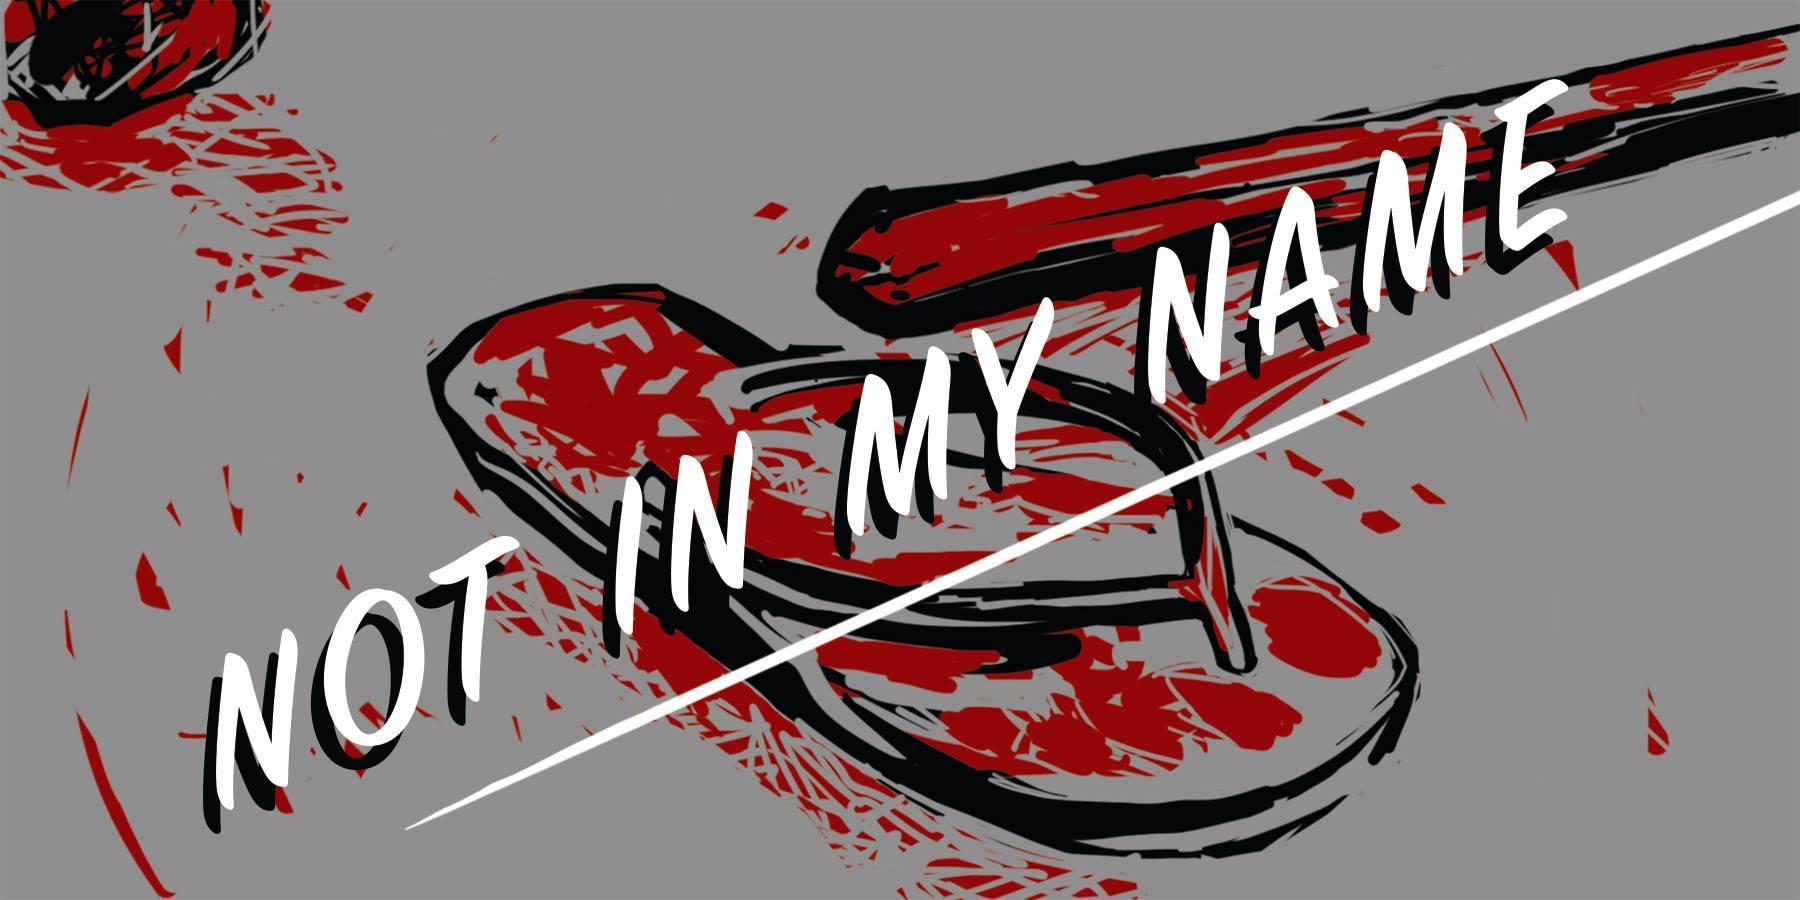 #NotInMyName #NoMoreLynching